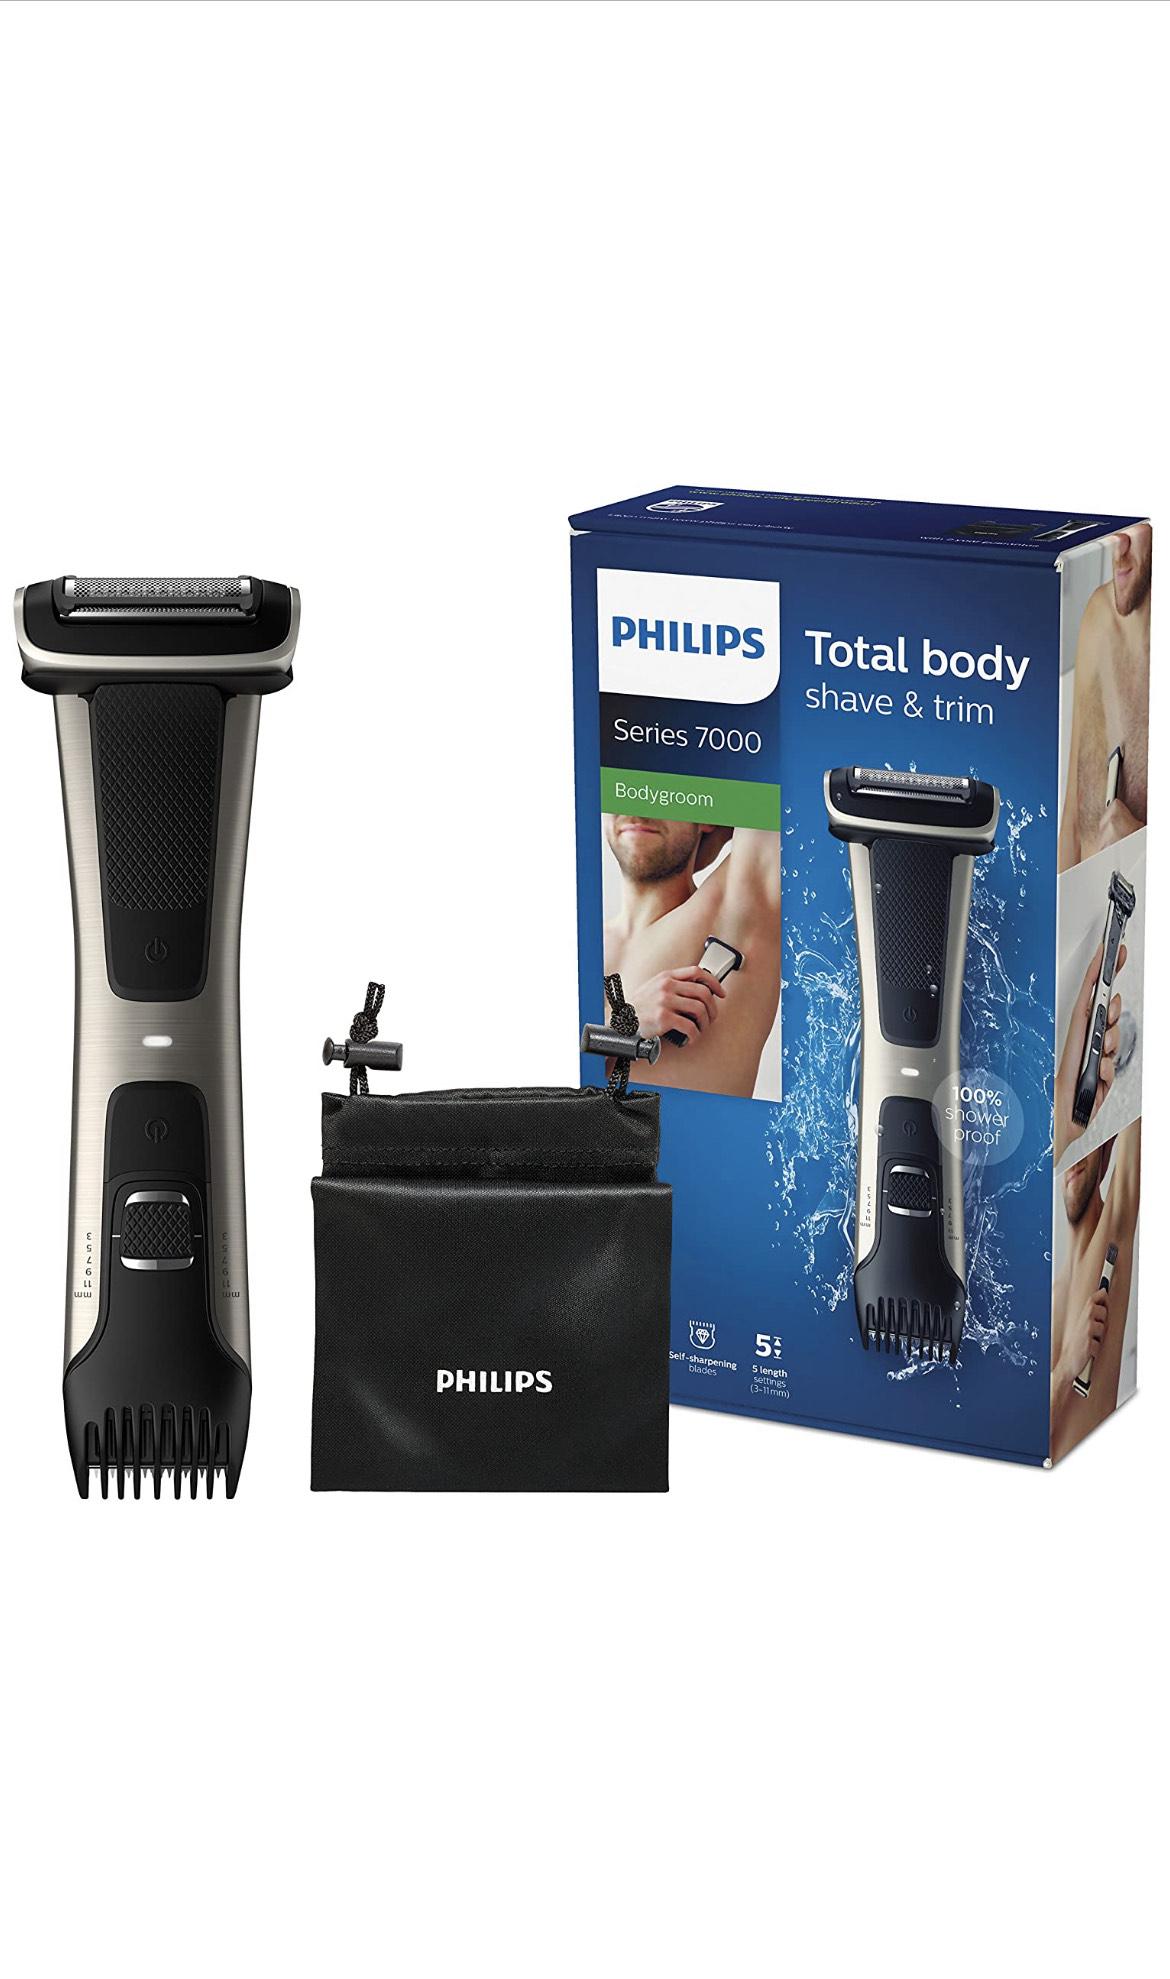 Philips BG7025/15 Bodygroom Series 7000 Amazon